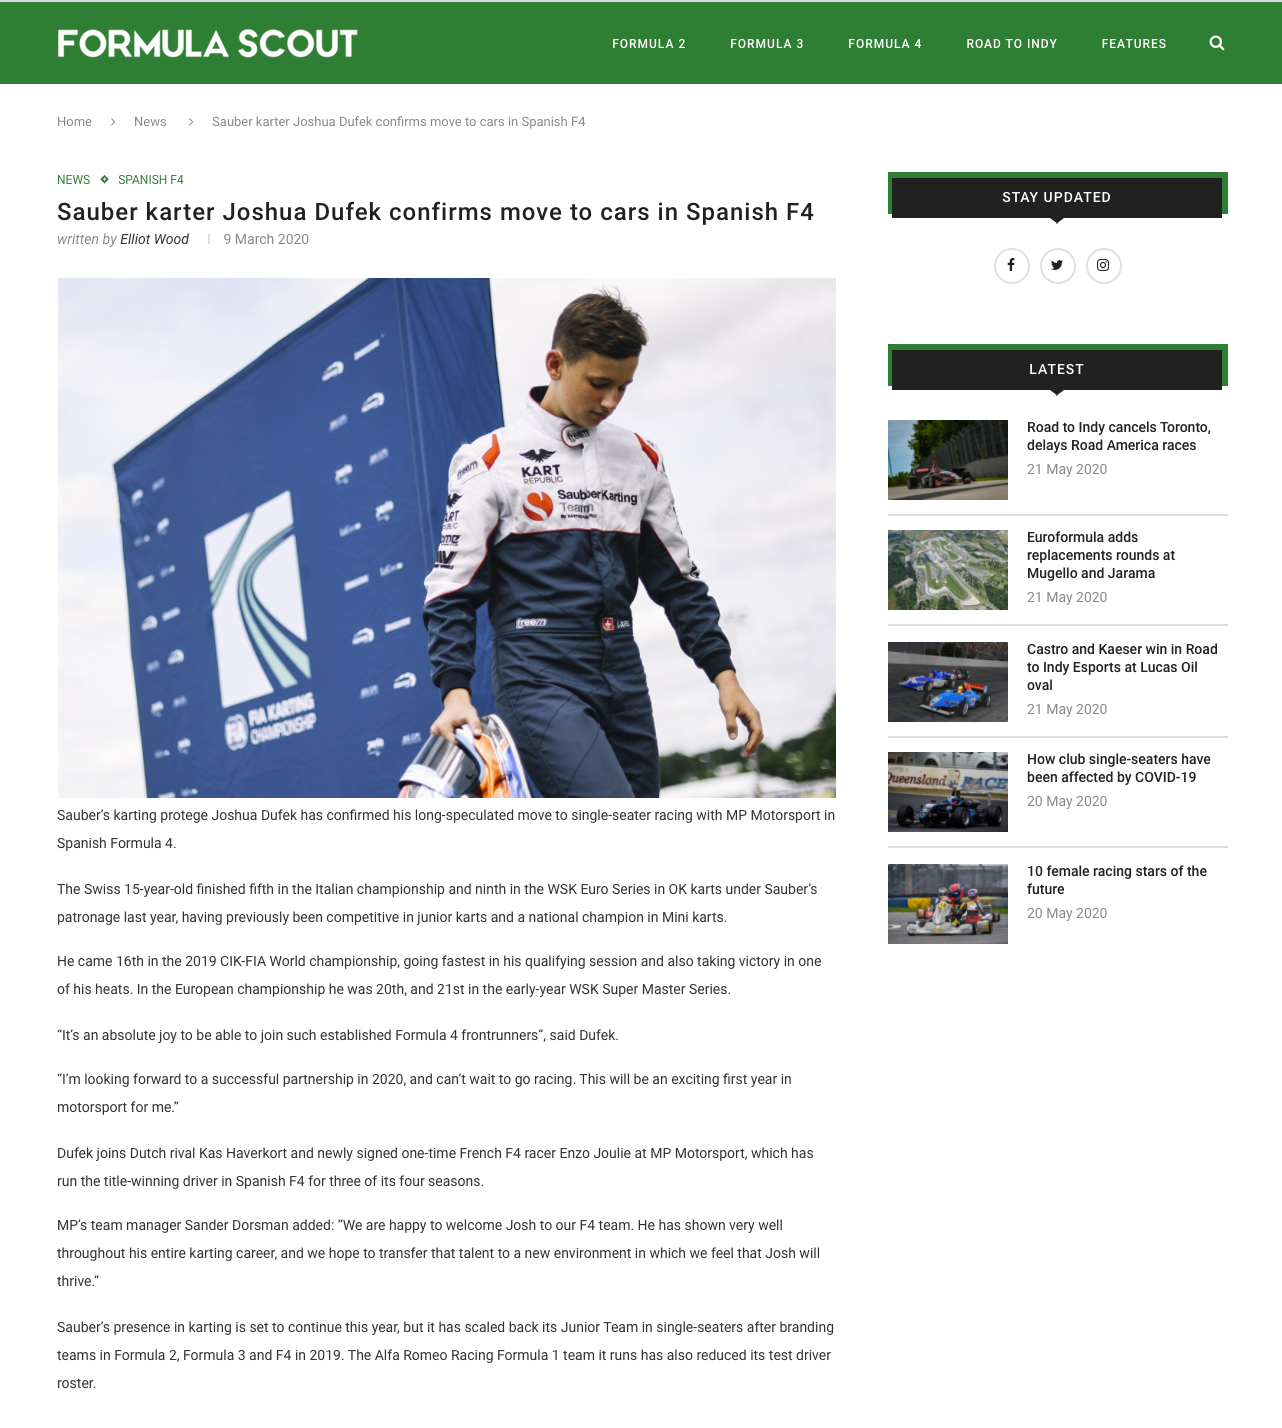 Sauber karter Joshua Dufek confirms move